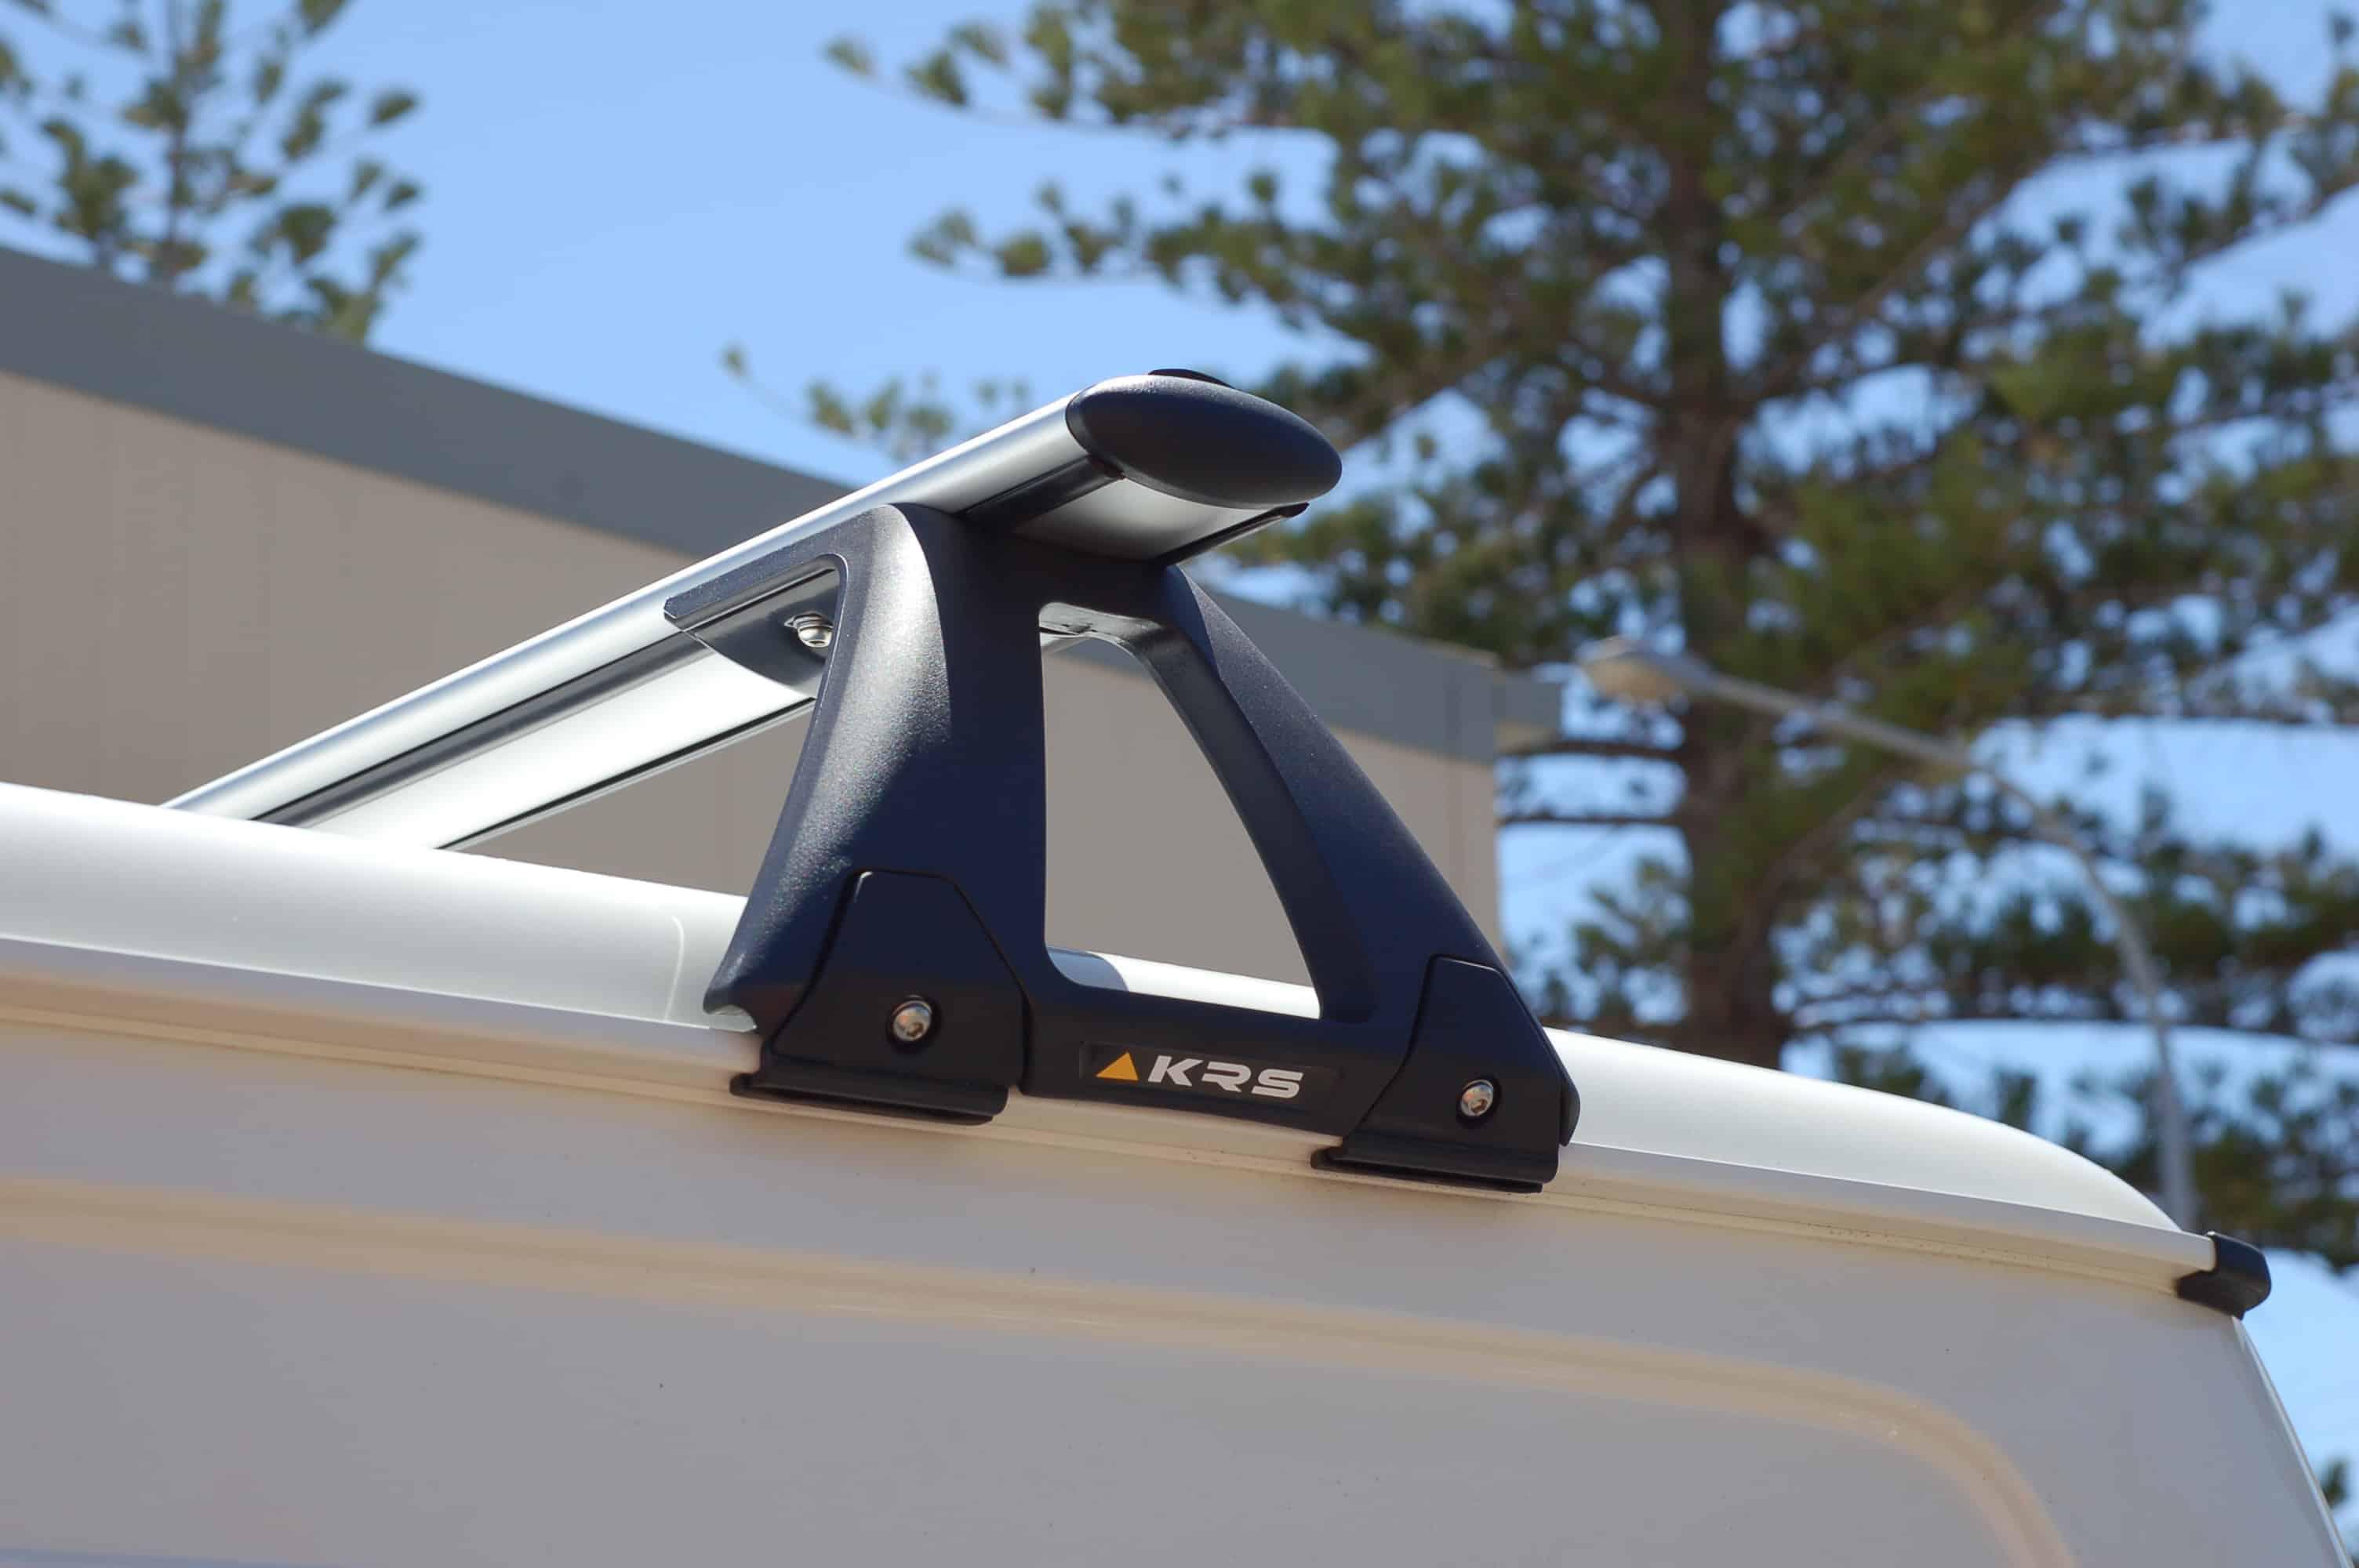 Toyota Hiace Roof Racks Guttermount Krs Australia